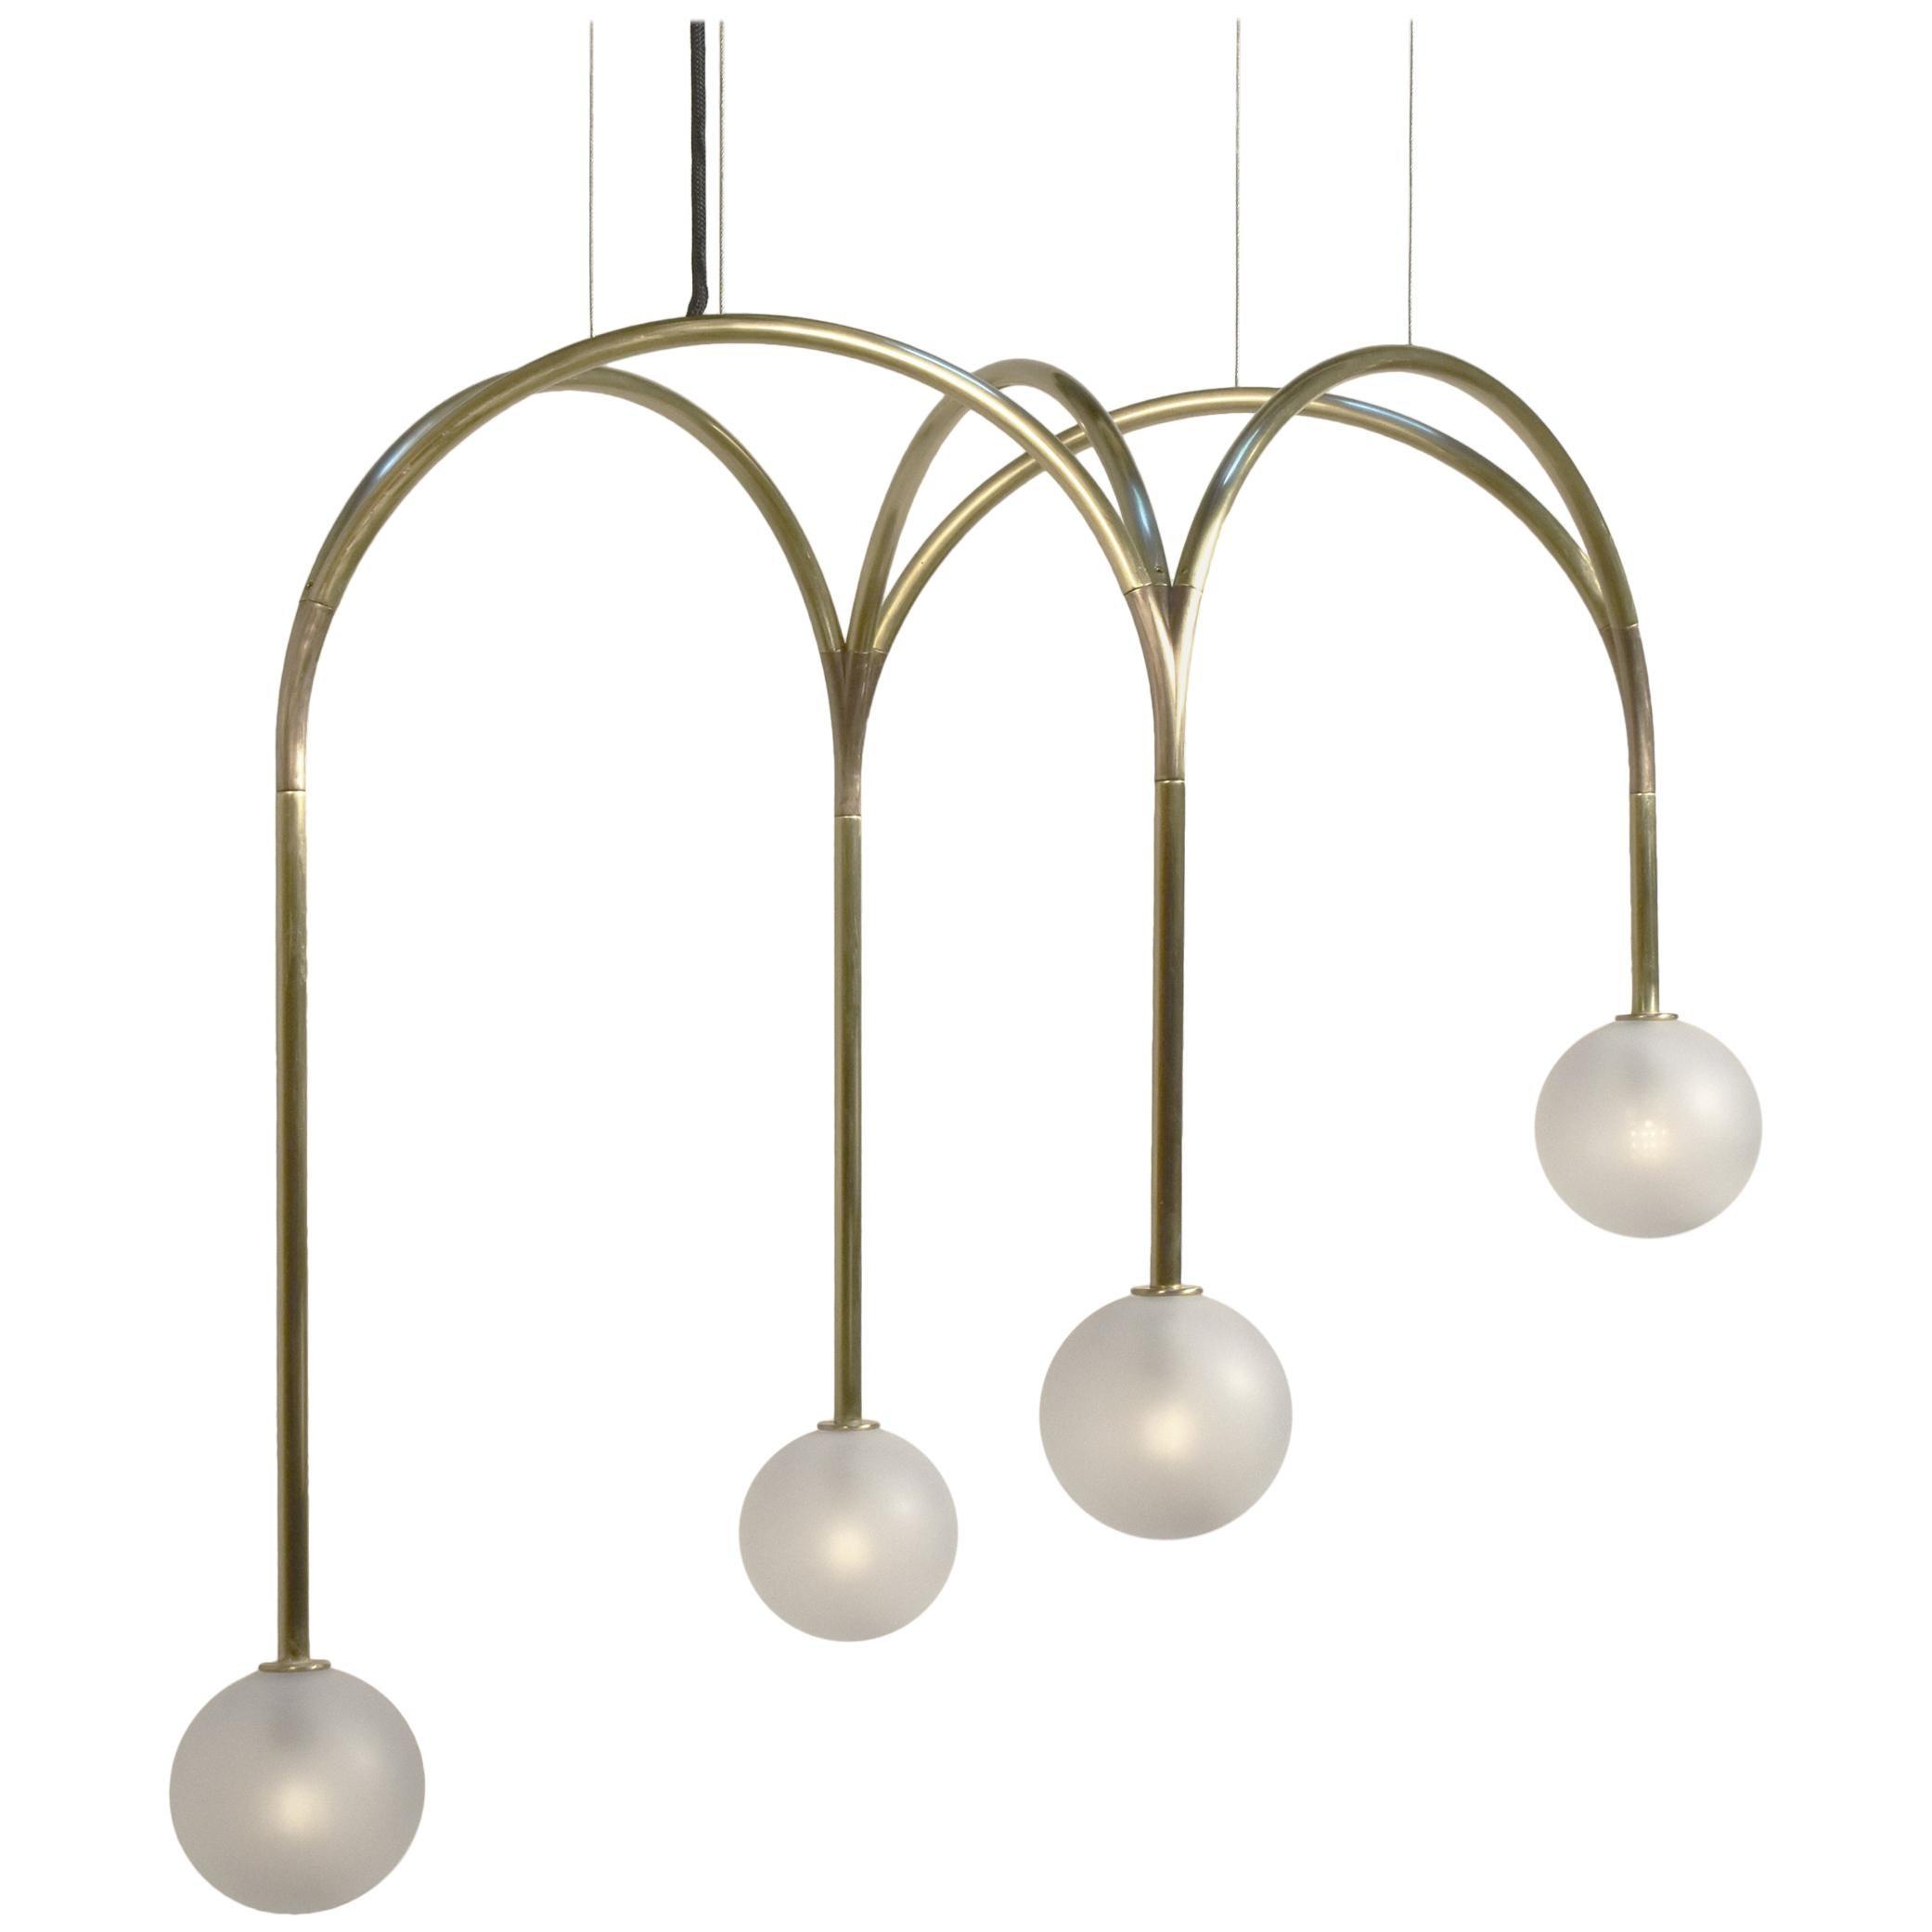 Rib Vault Light, Brass Chandelier in Diamond and Customizable Configurations